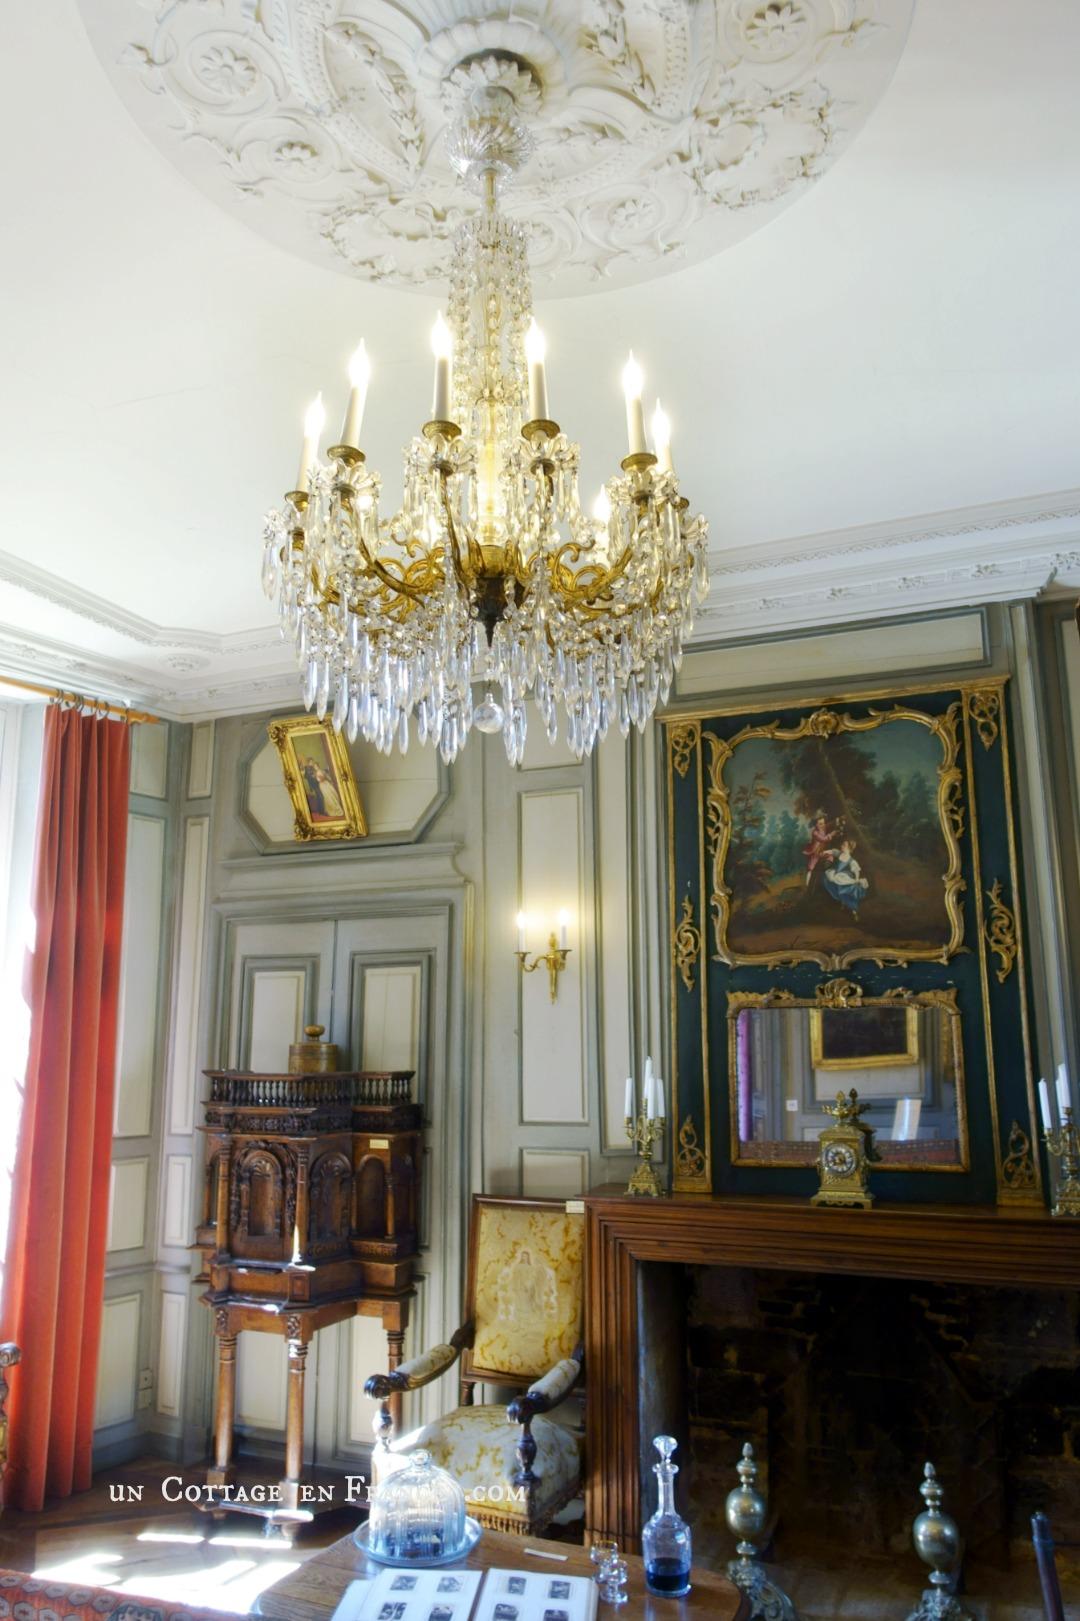 Un intérieur historique | A period interior (Sarlat-la-Caneda – Dordogne)